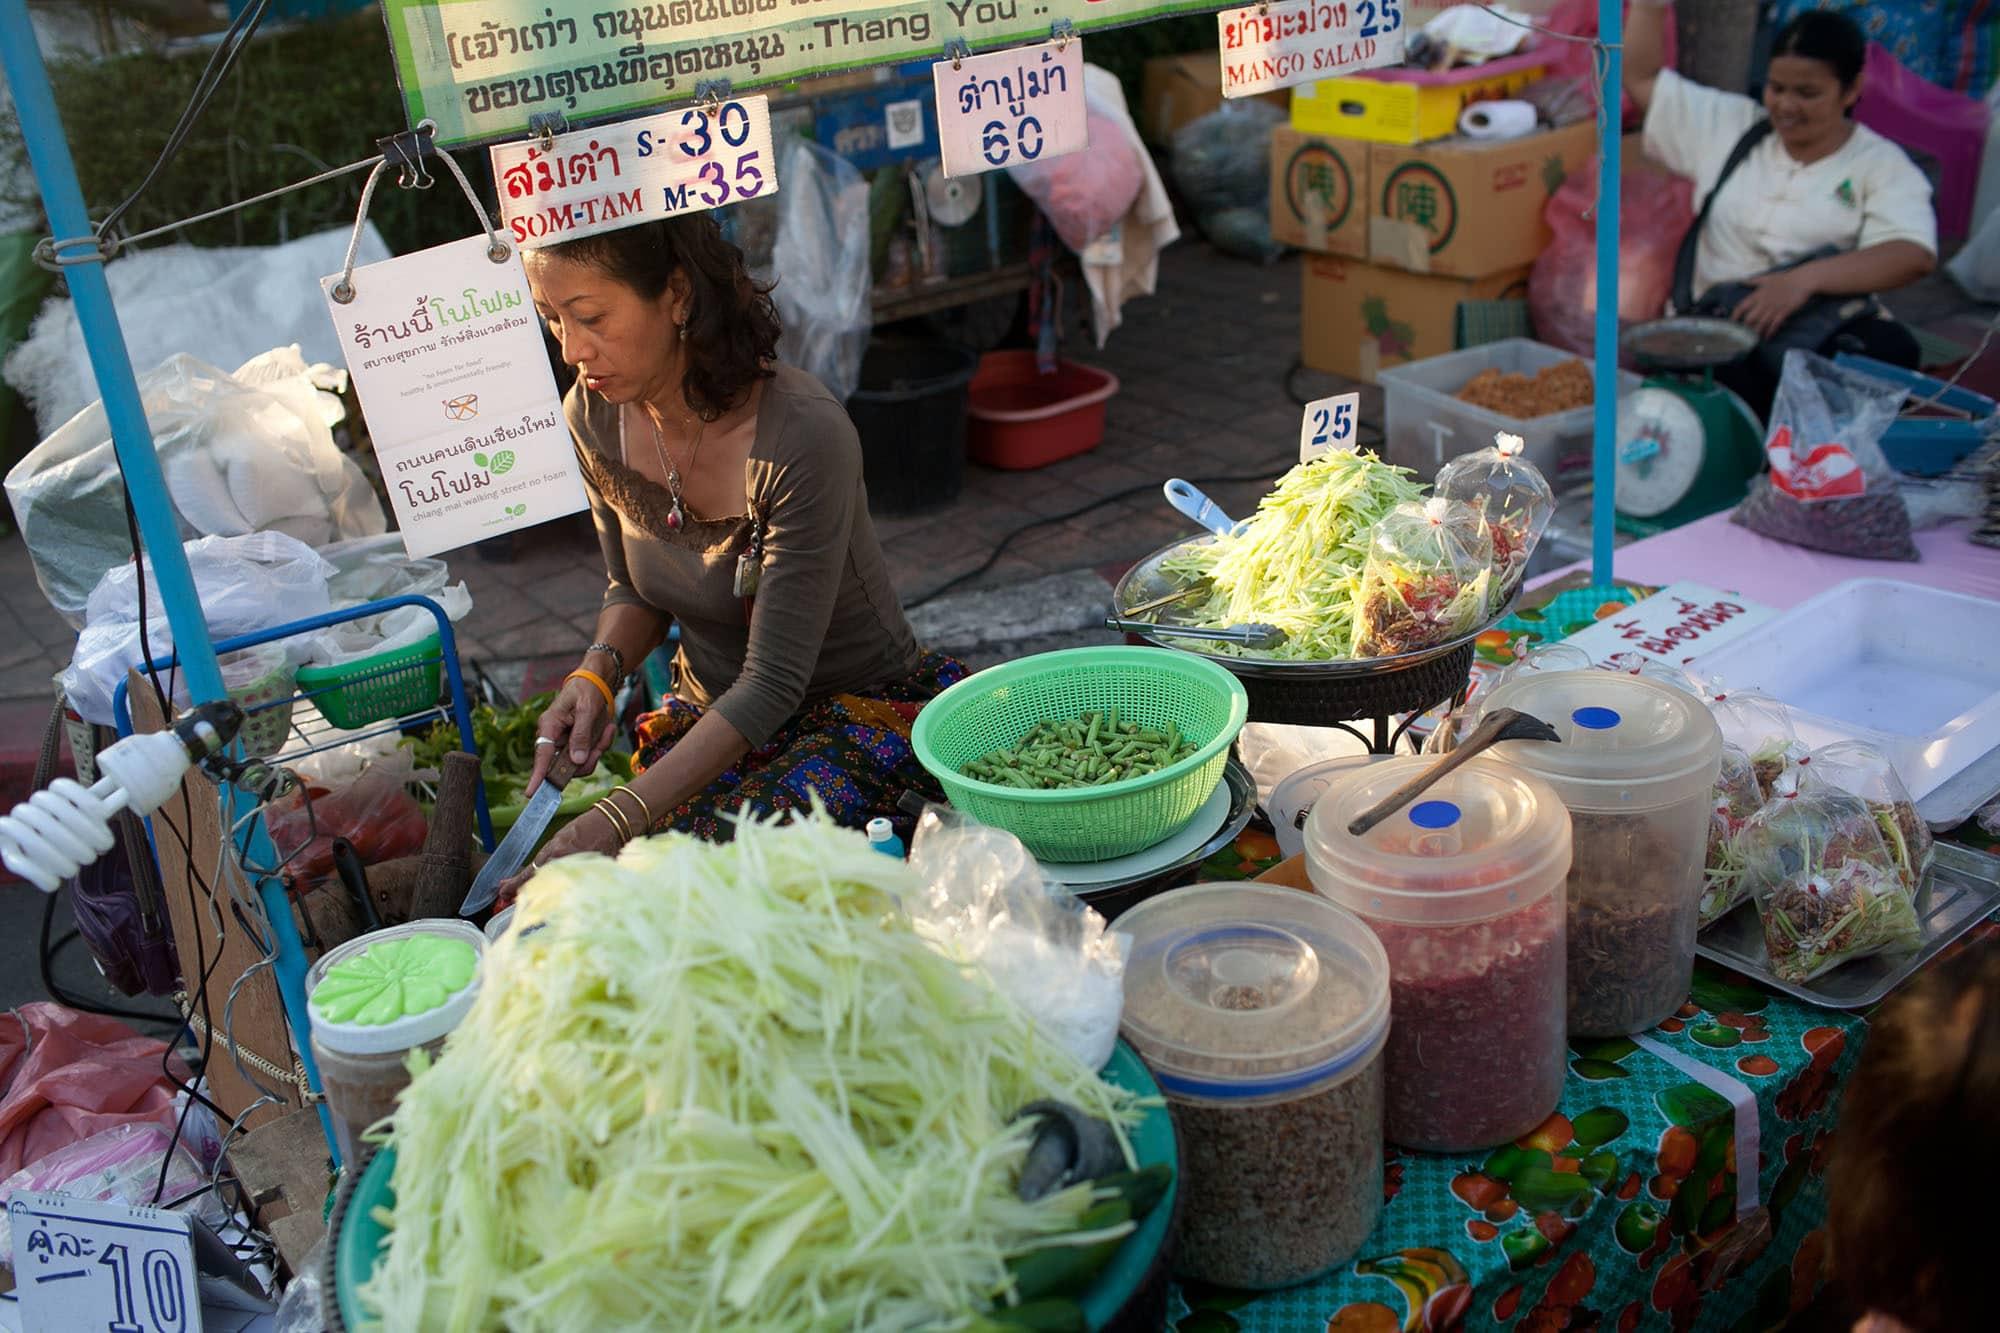 Sunday Market in Chiang Mai, Thailand